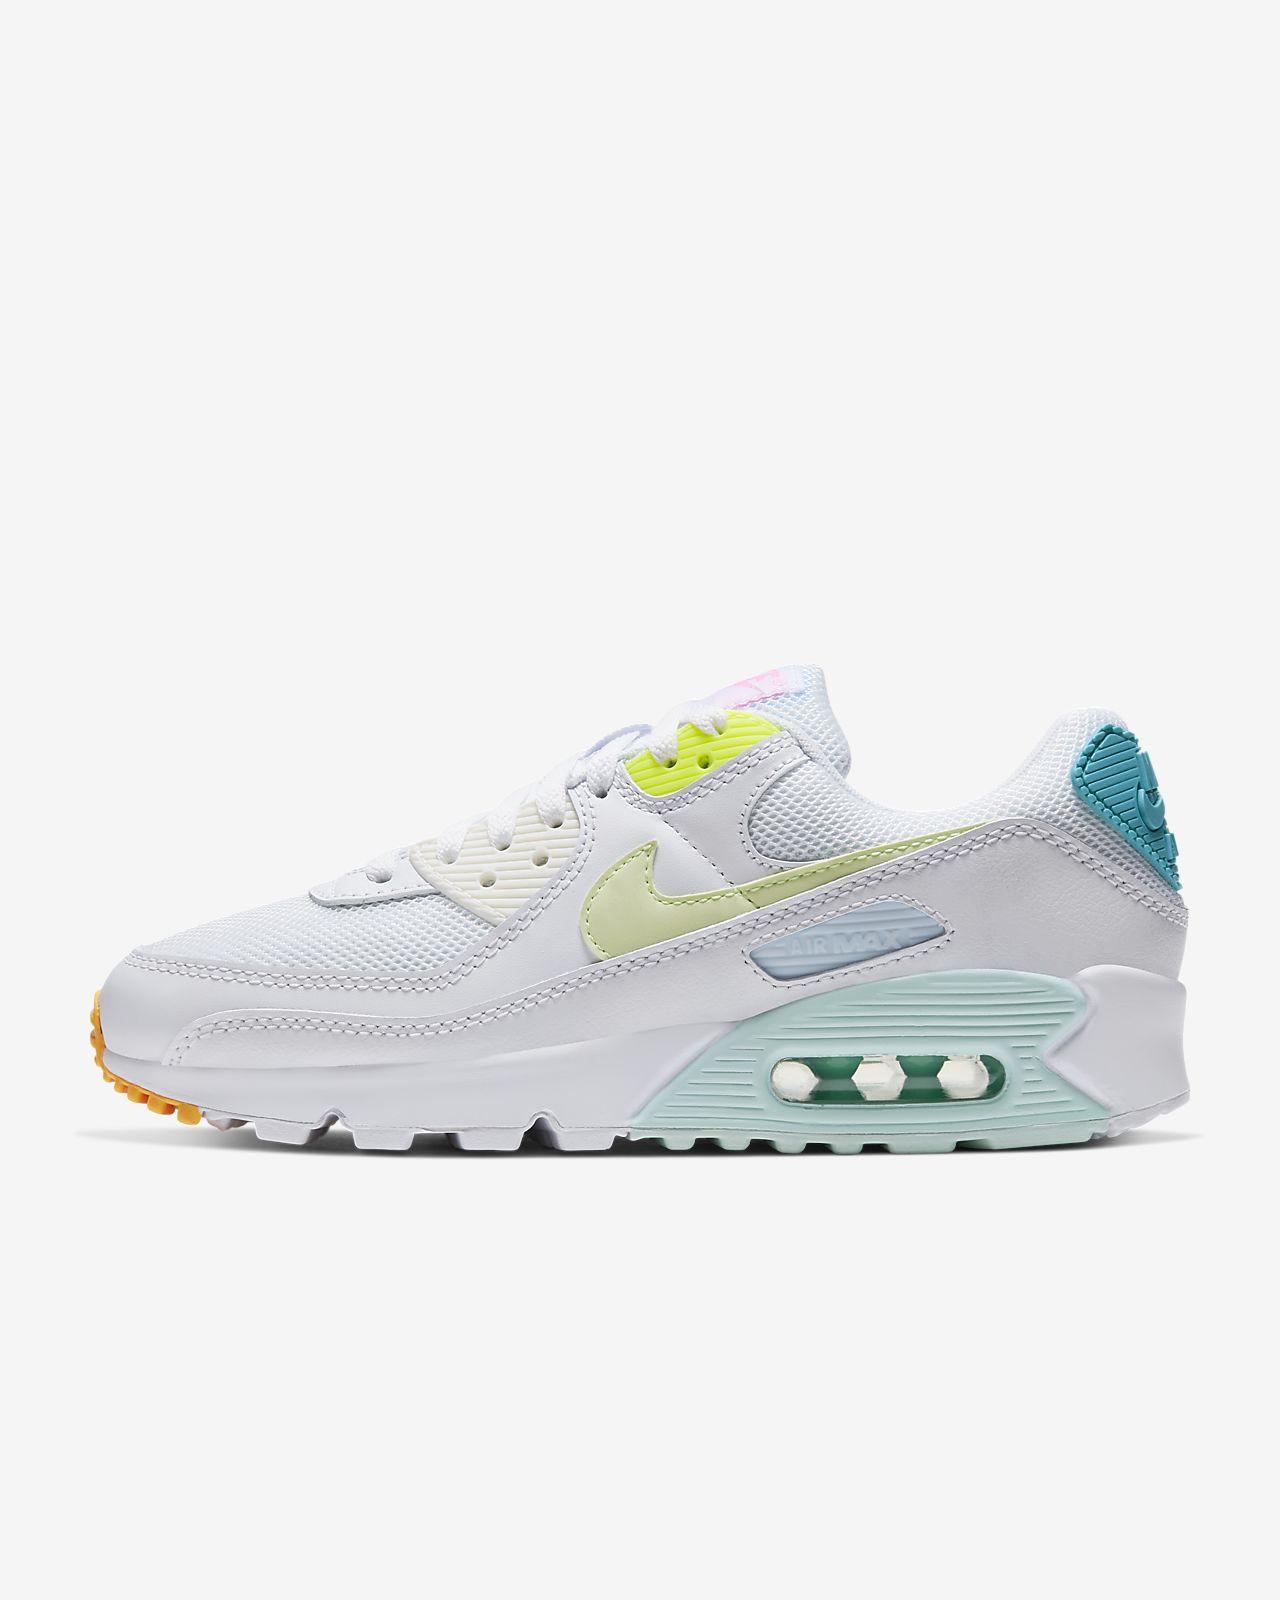 Sapatilhas Nike Air Max 90 para mulher